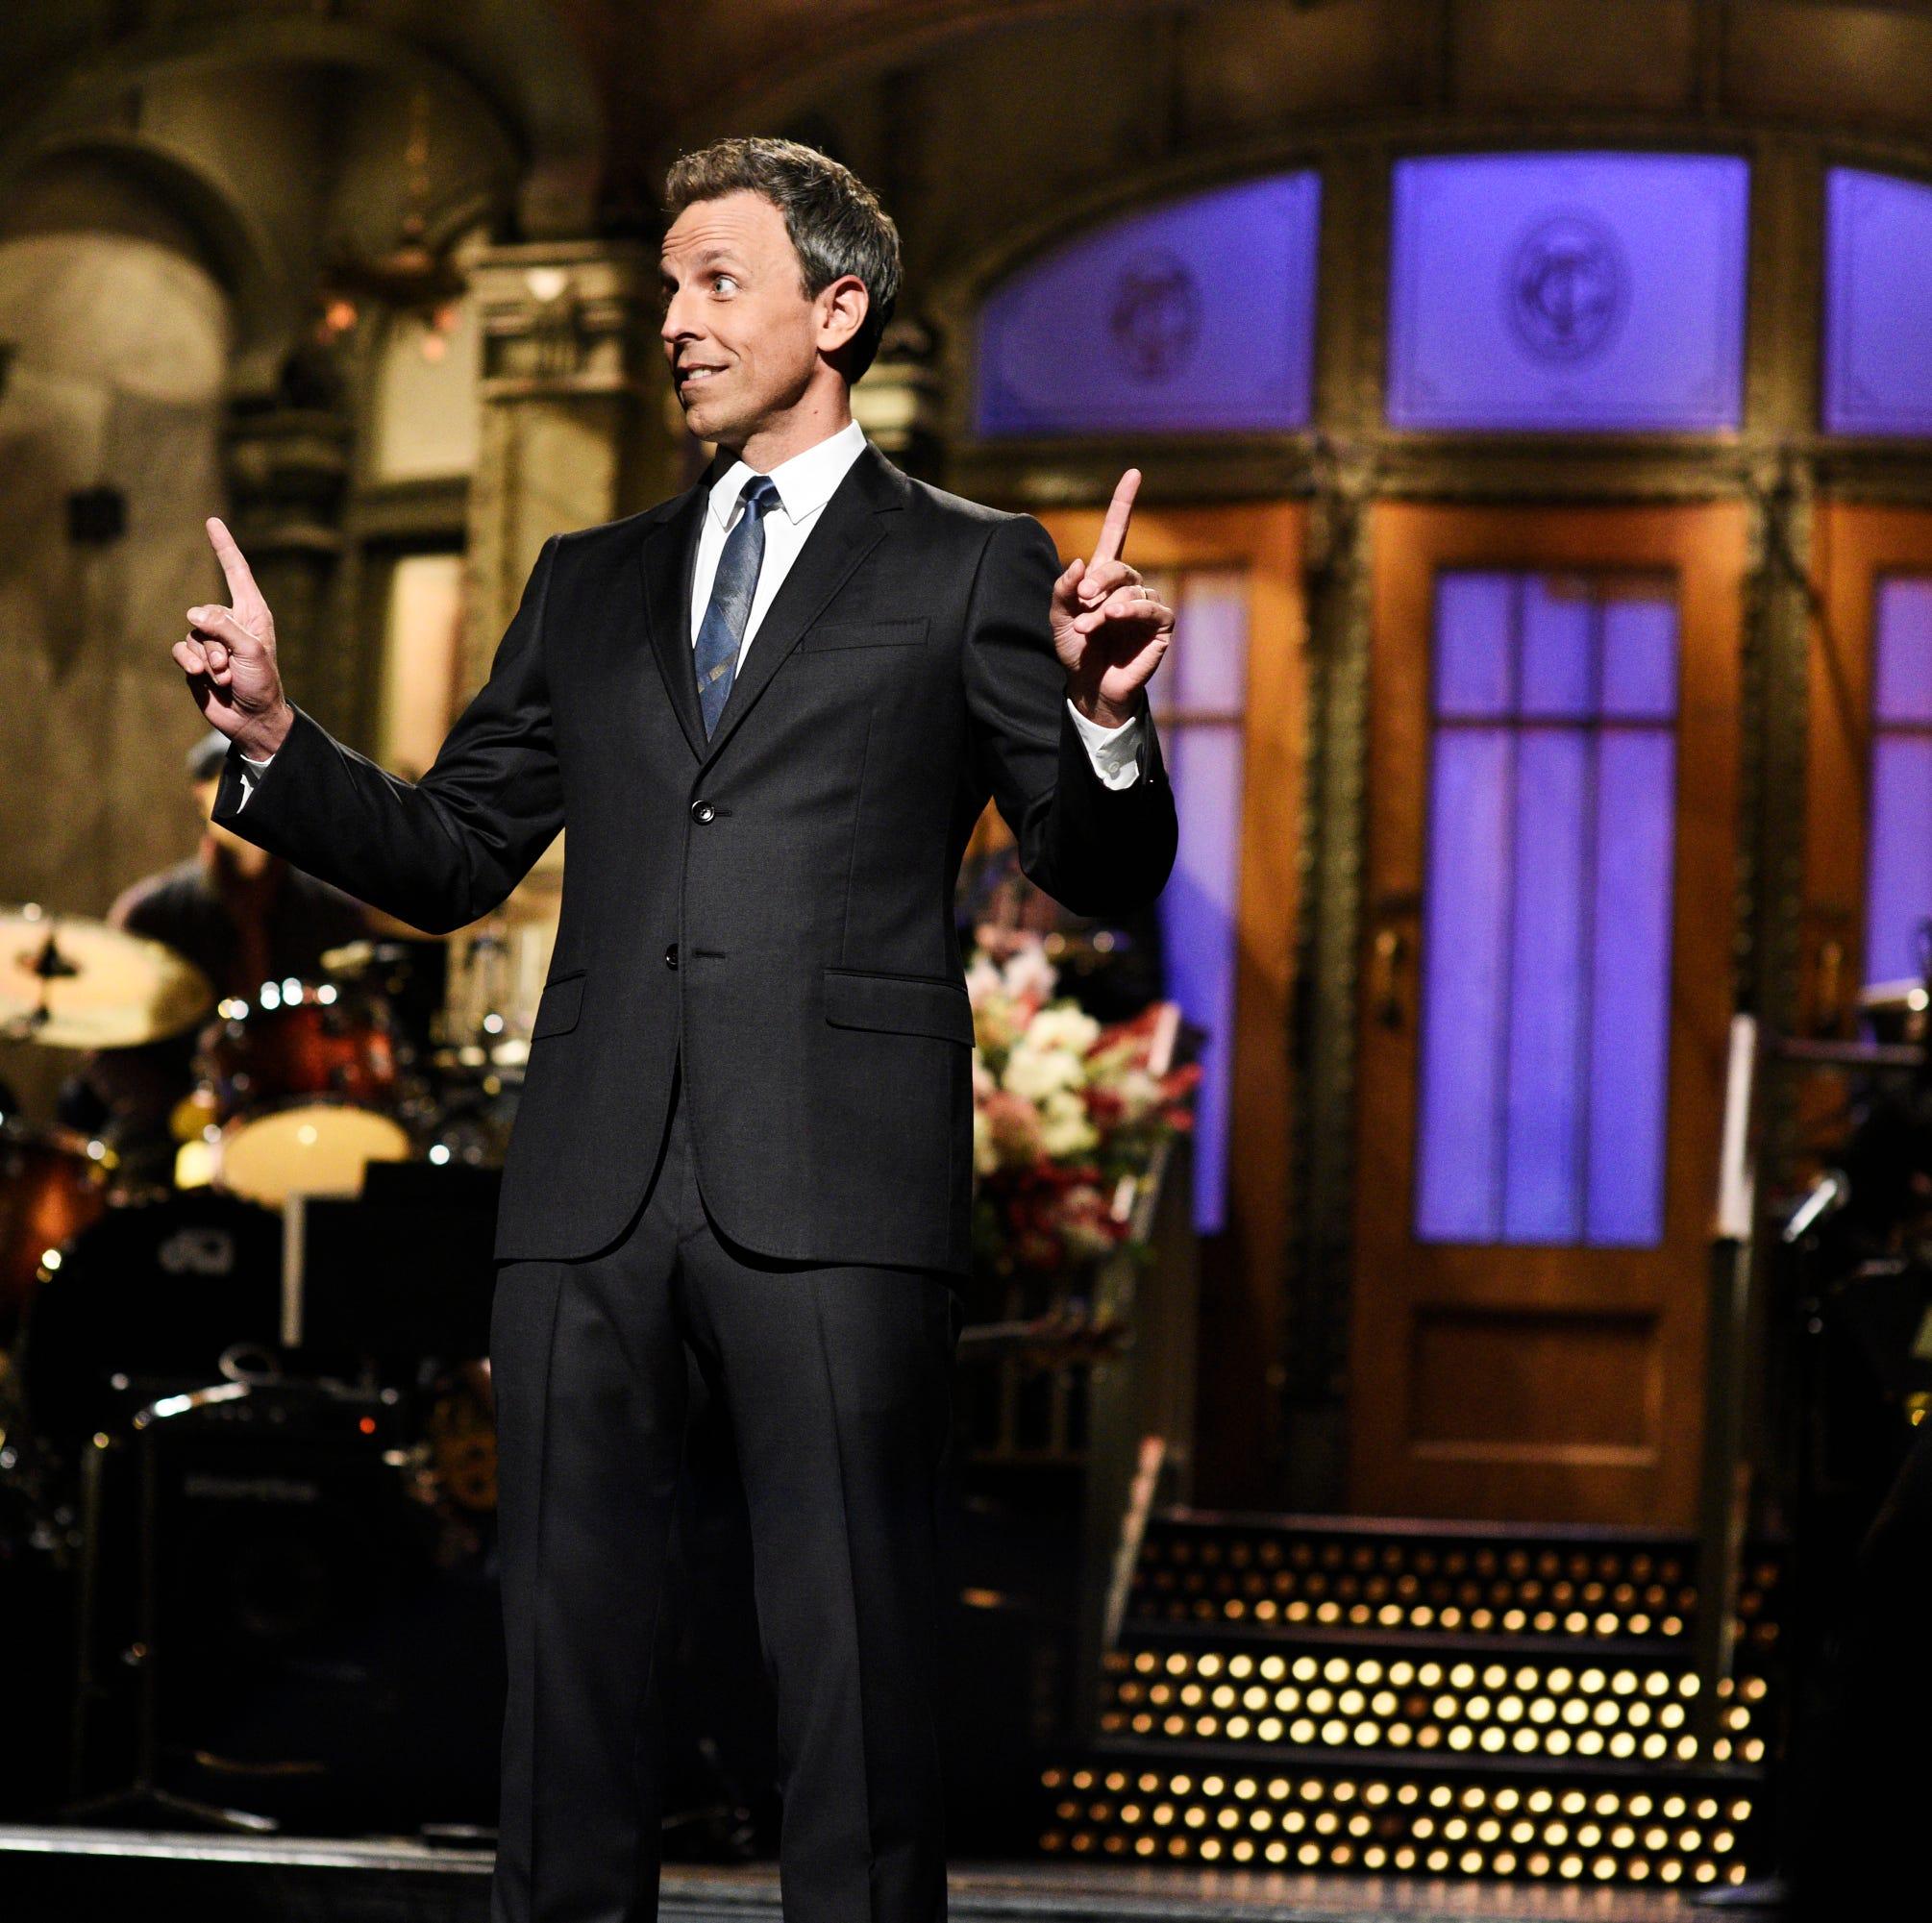 Saturday Night Live writes AOC Community Media into the script